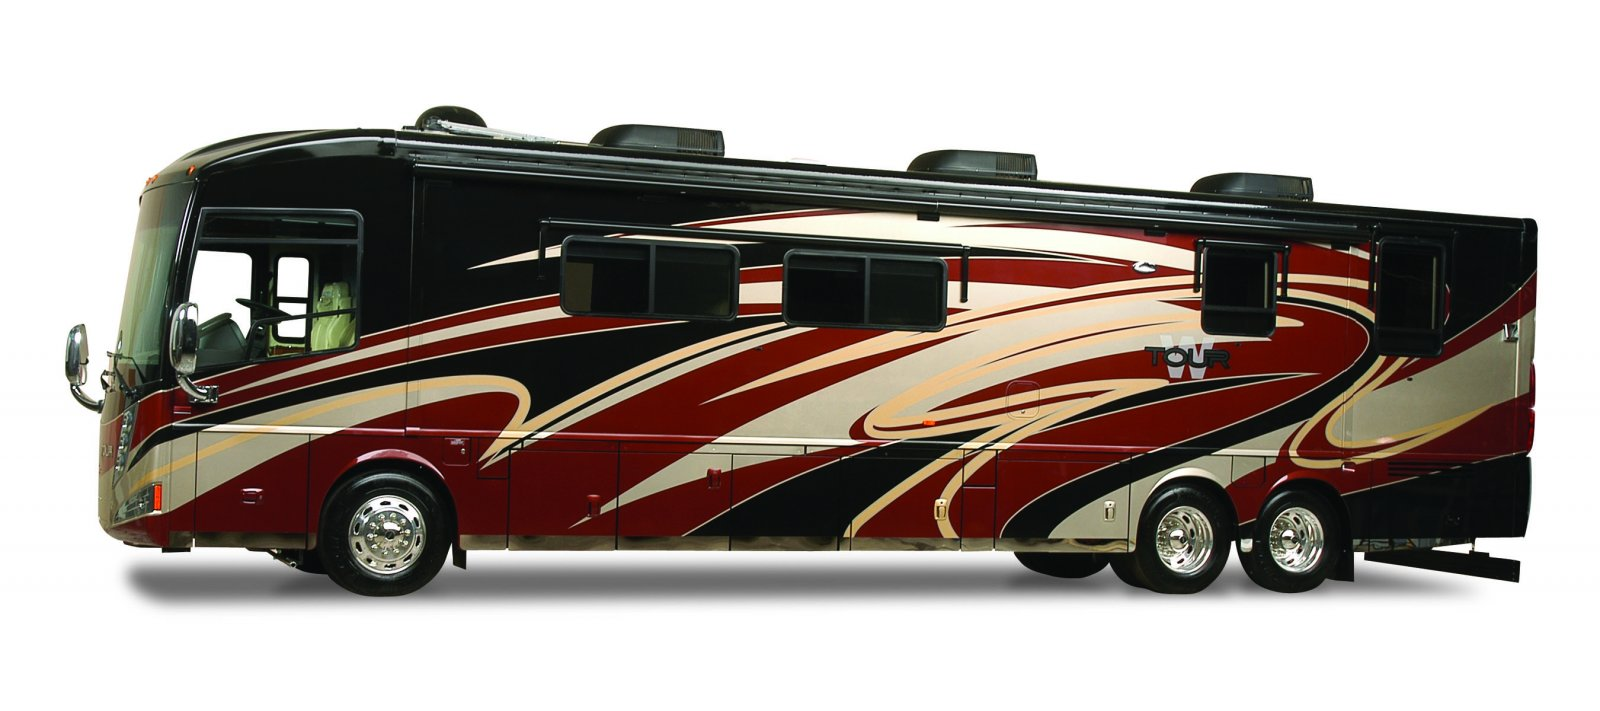 Click image for larger version  Name:2011 Winnebago Tour exterior.jpg Views:202 Size:143.2 KB ID:5809